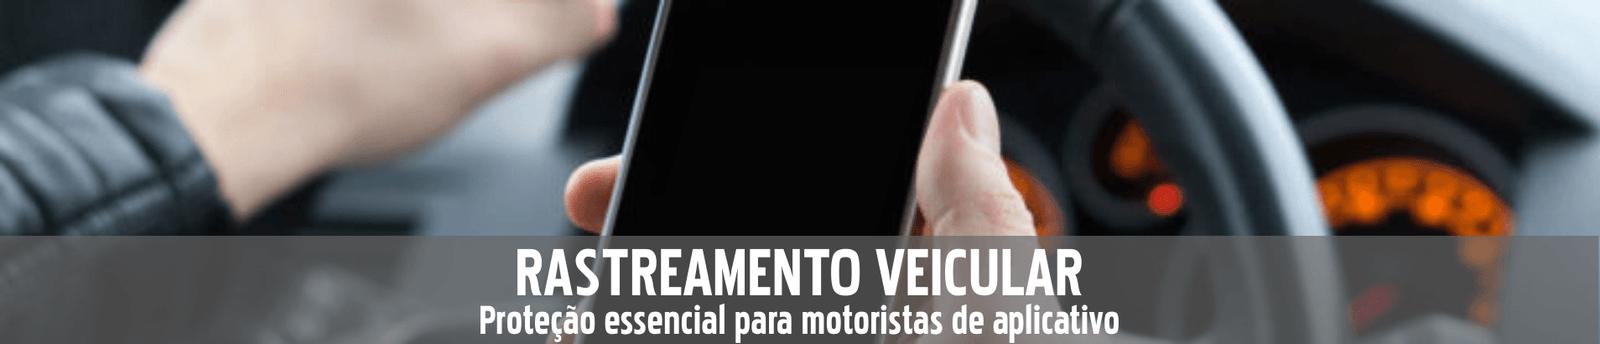 Rastreamento Veicular Monitoramento - ITA